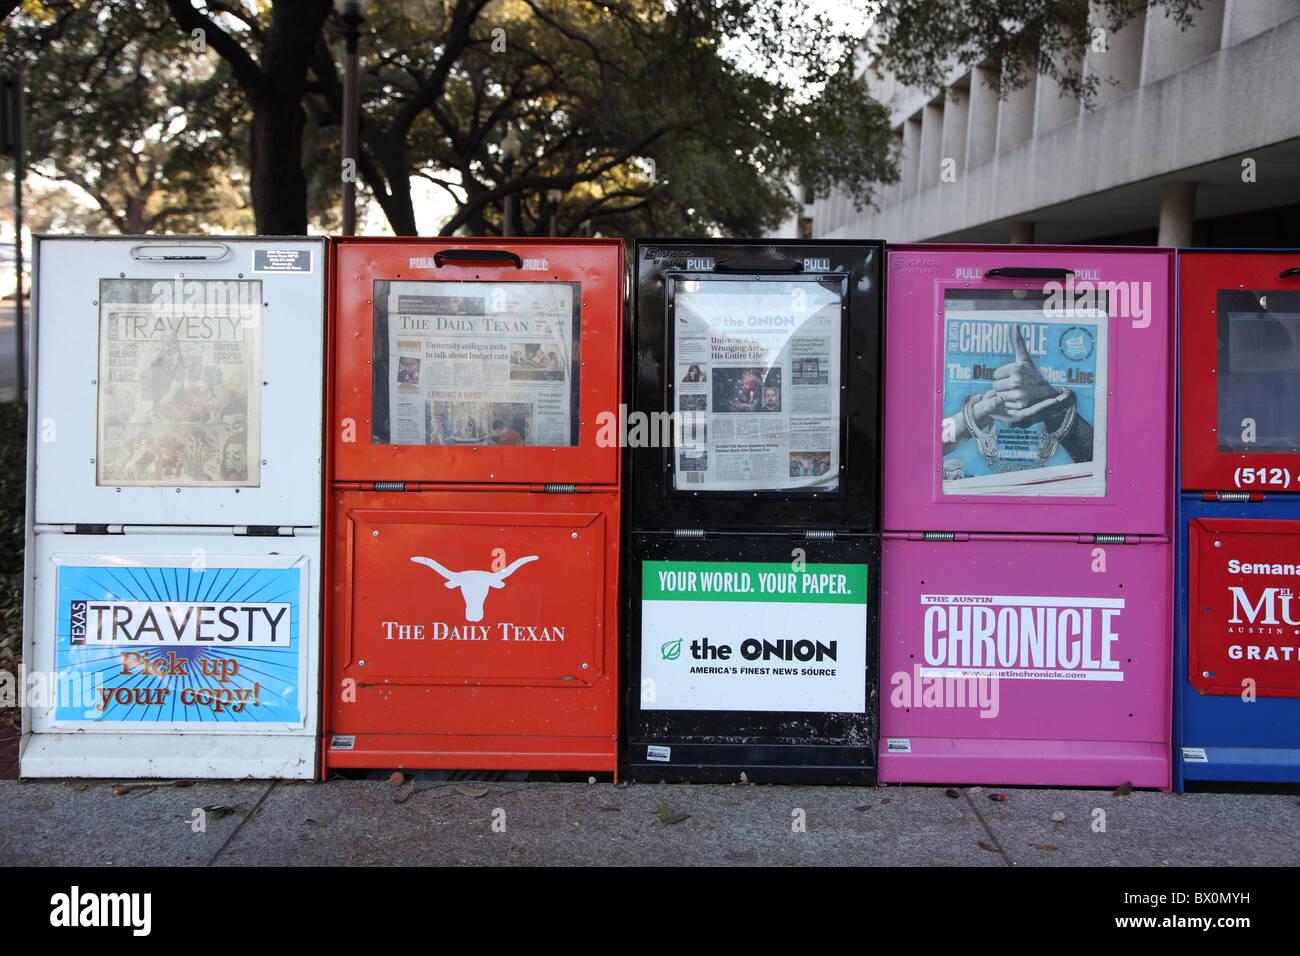 Texan newspaper stand, Austin, Texas - Stock Image